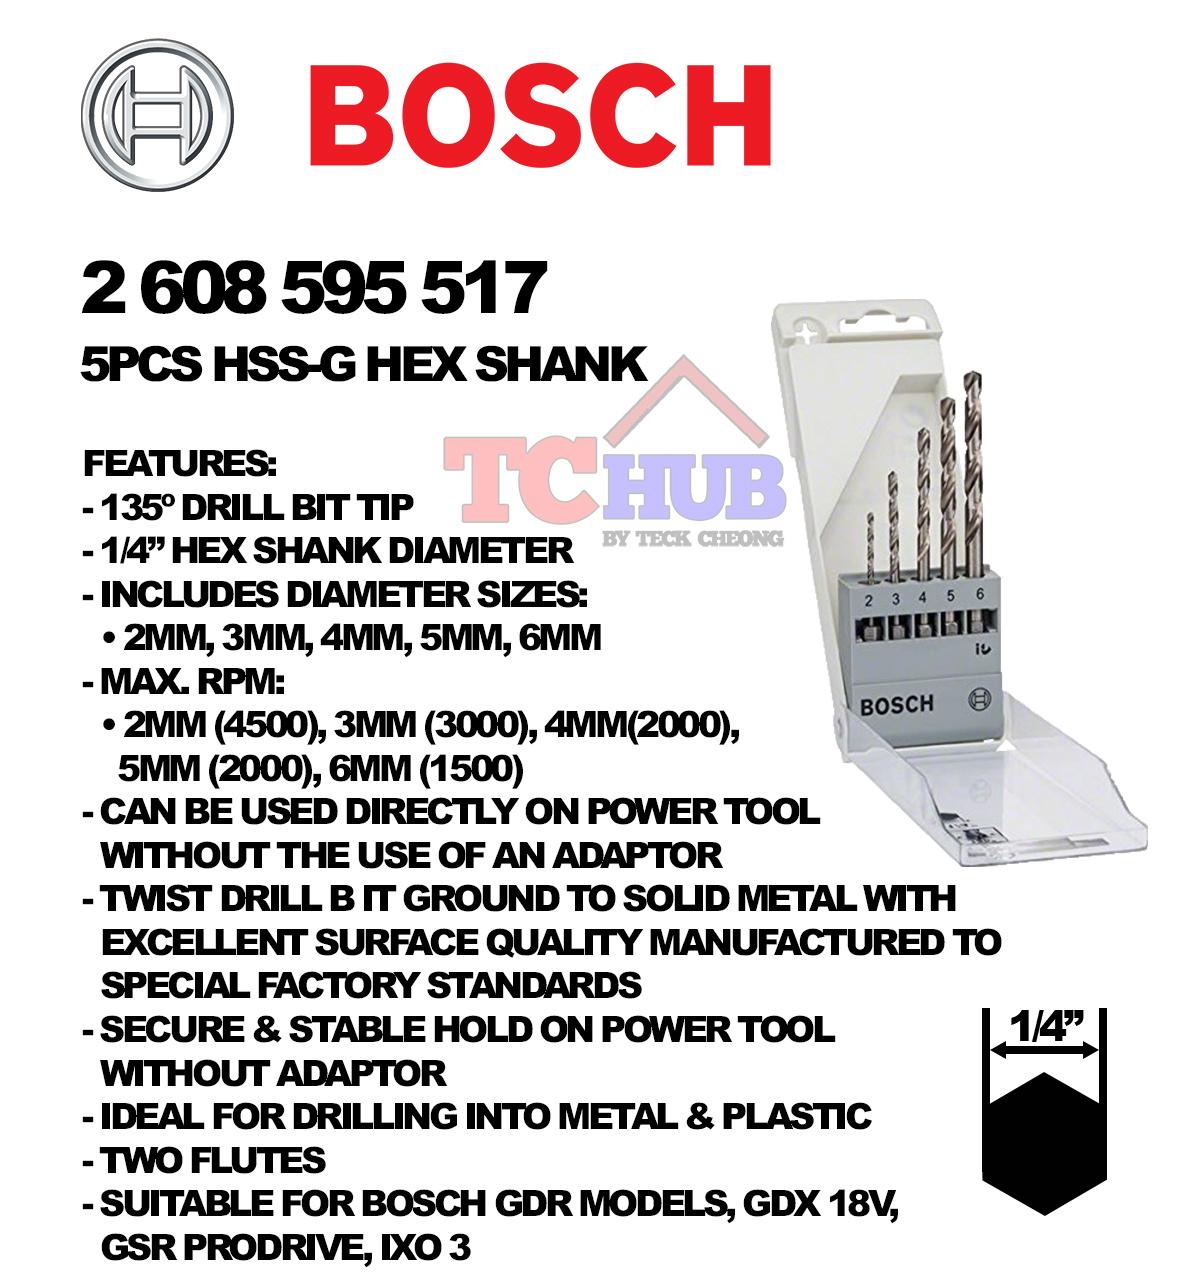 buy bosch ixo 3 cordless screwdriver world smallest screwdriver with magnetic bit holder 3 6 v. Black Bedroom Furniture Sets. Home Design Ideas